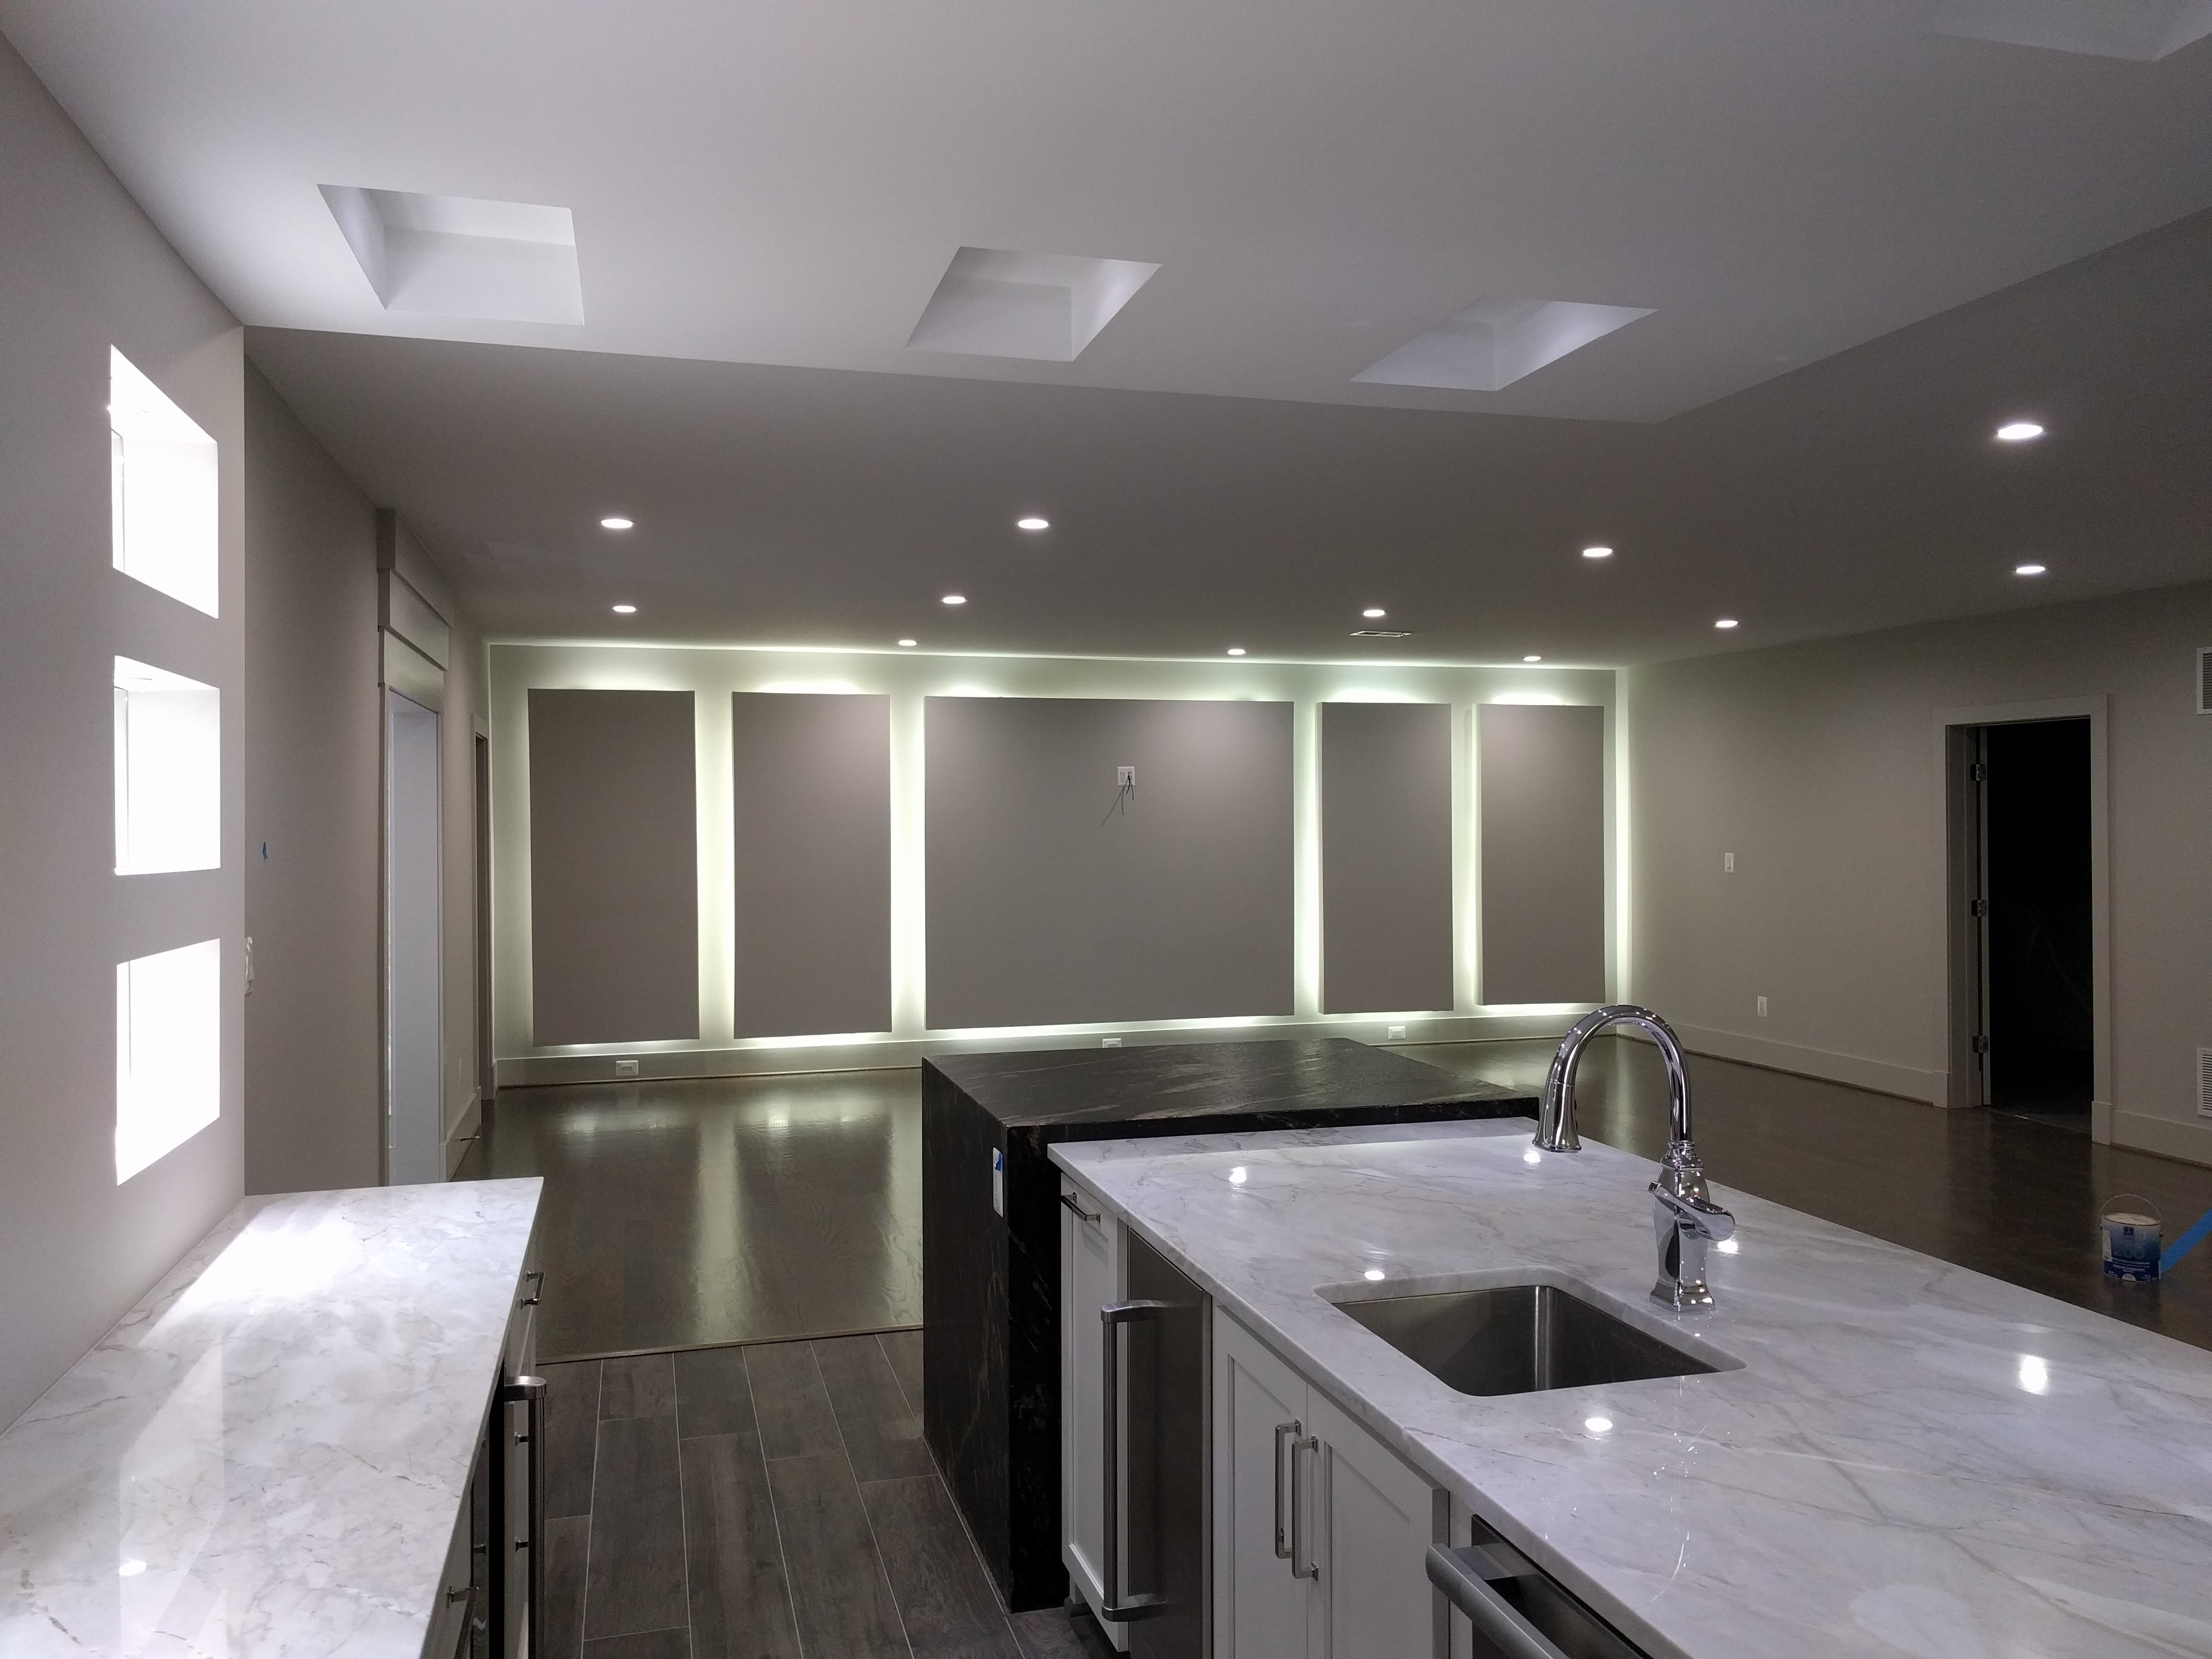 Jimenez House - Arlington 20